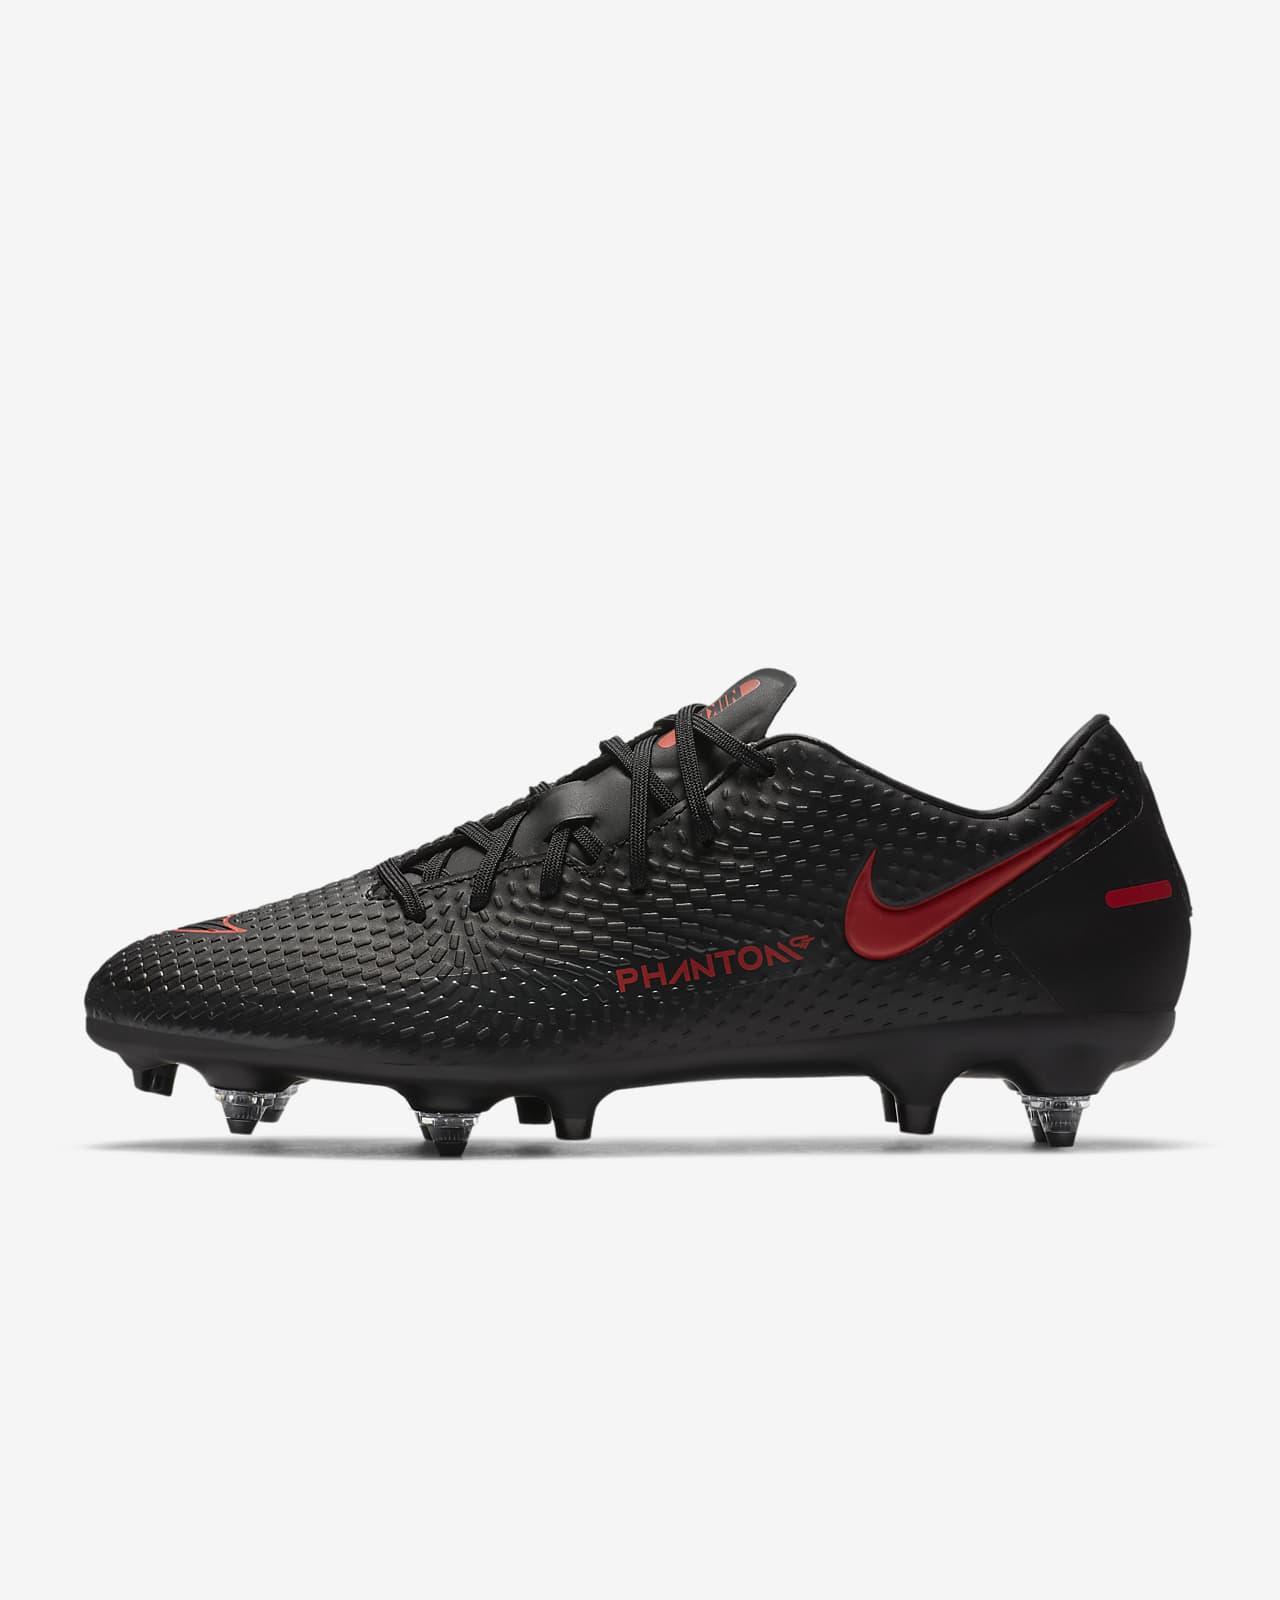 Nike Phantom GT Academy SG-Pro AC Soft-Ground Football Boot